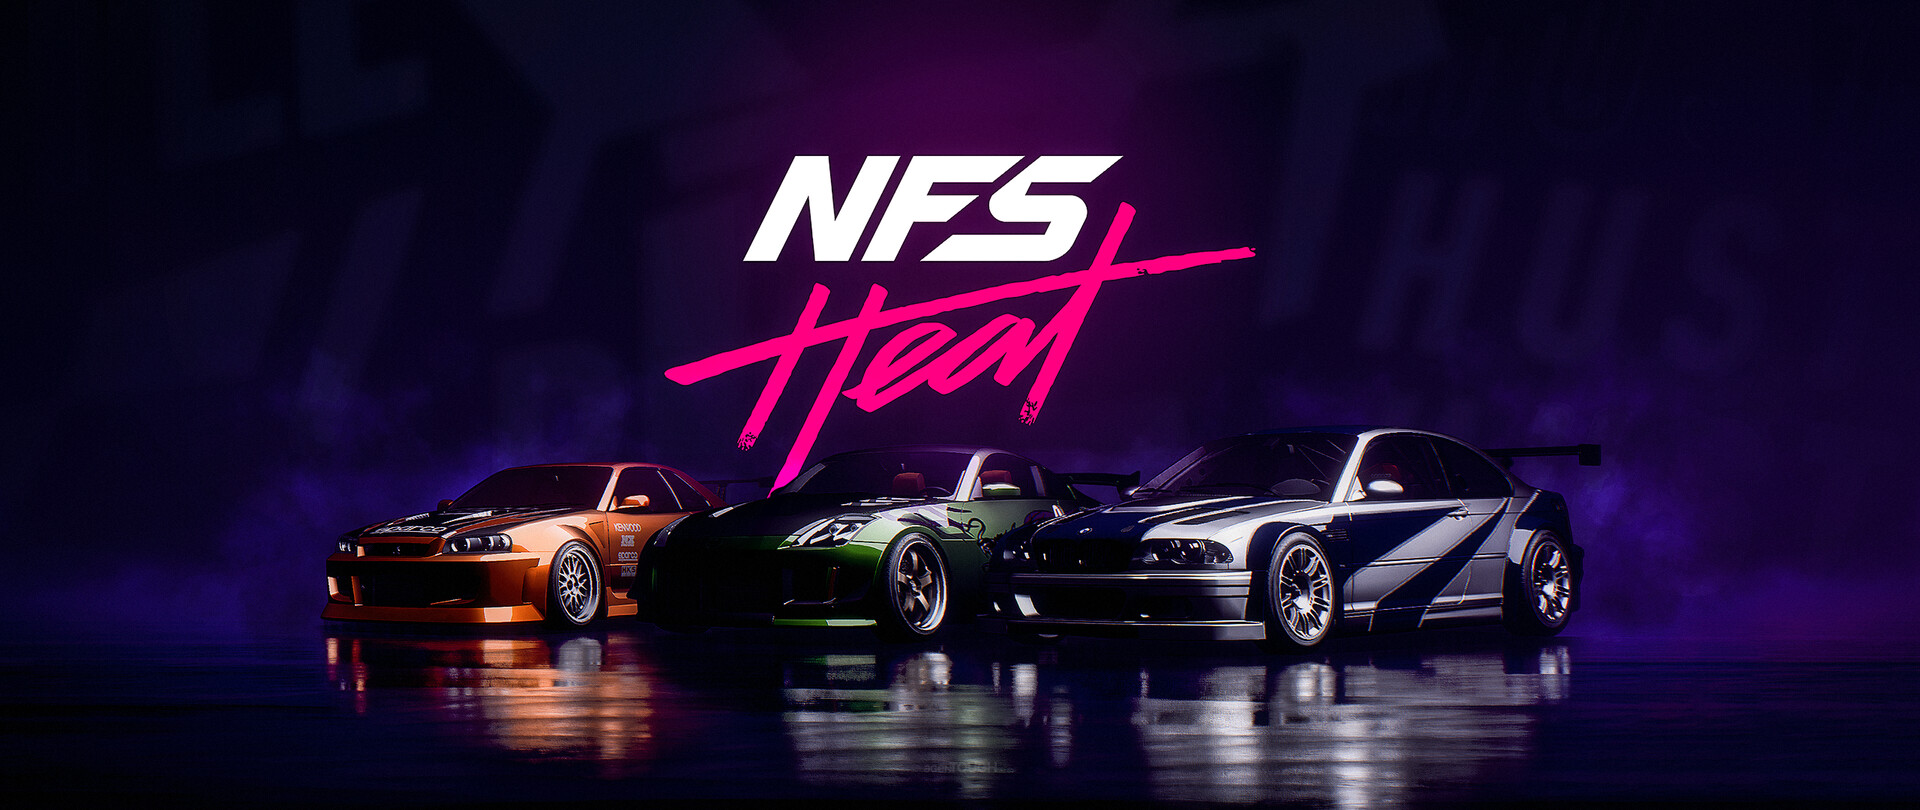 Artstation Nfs Heat Icons agentough